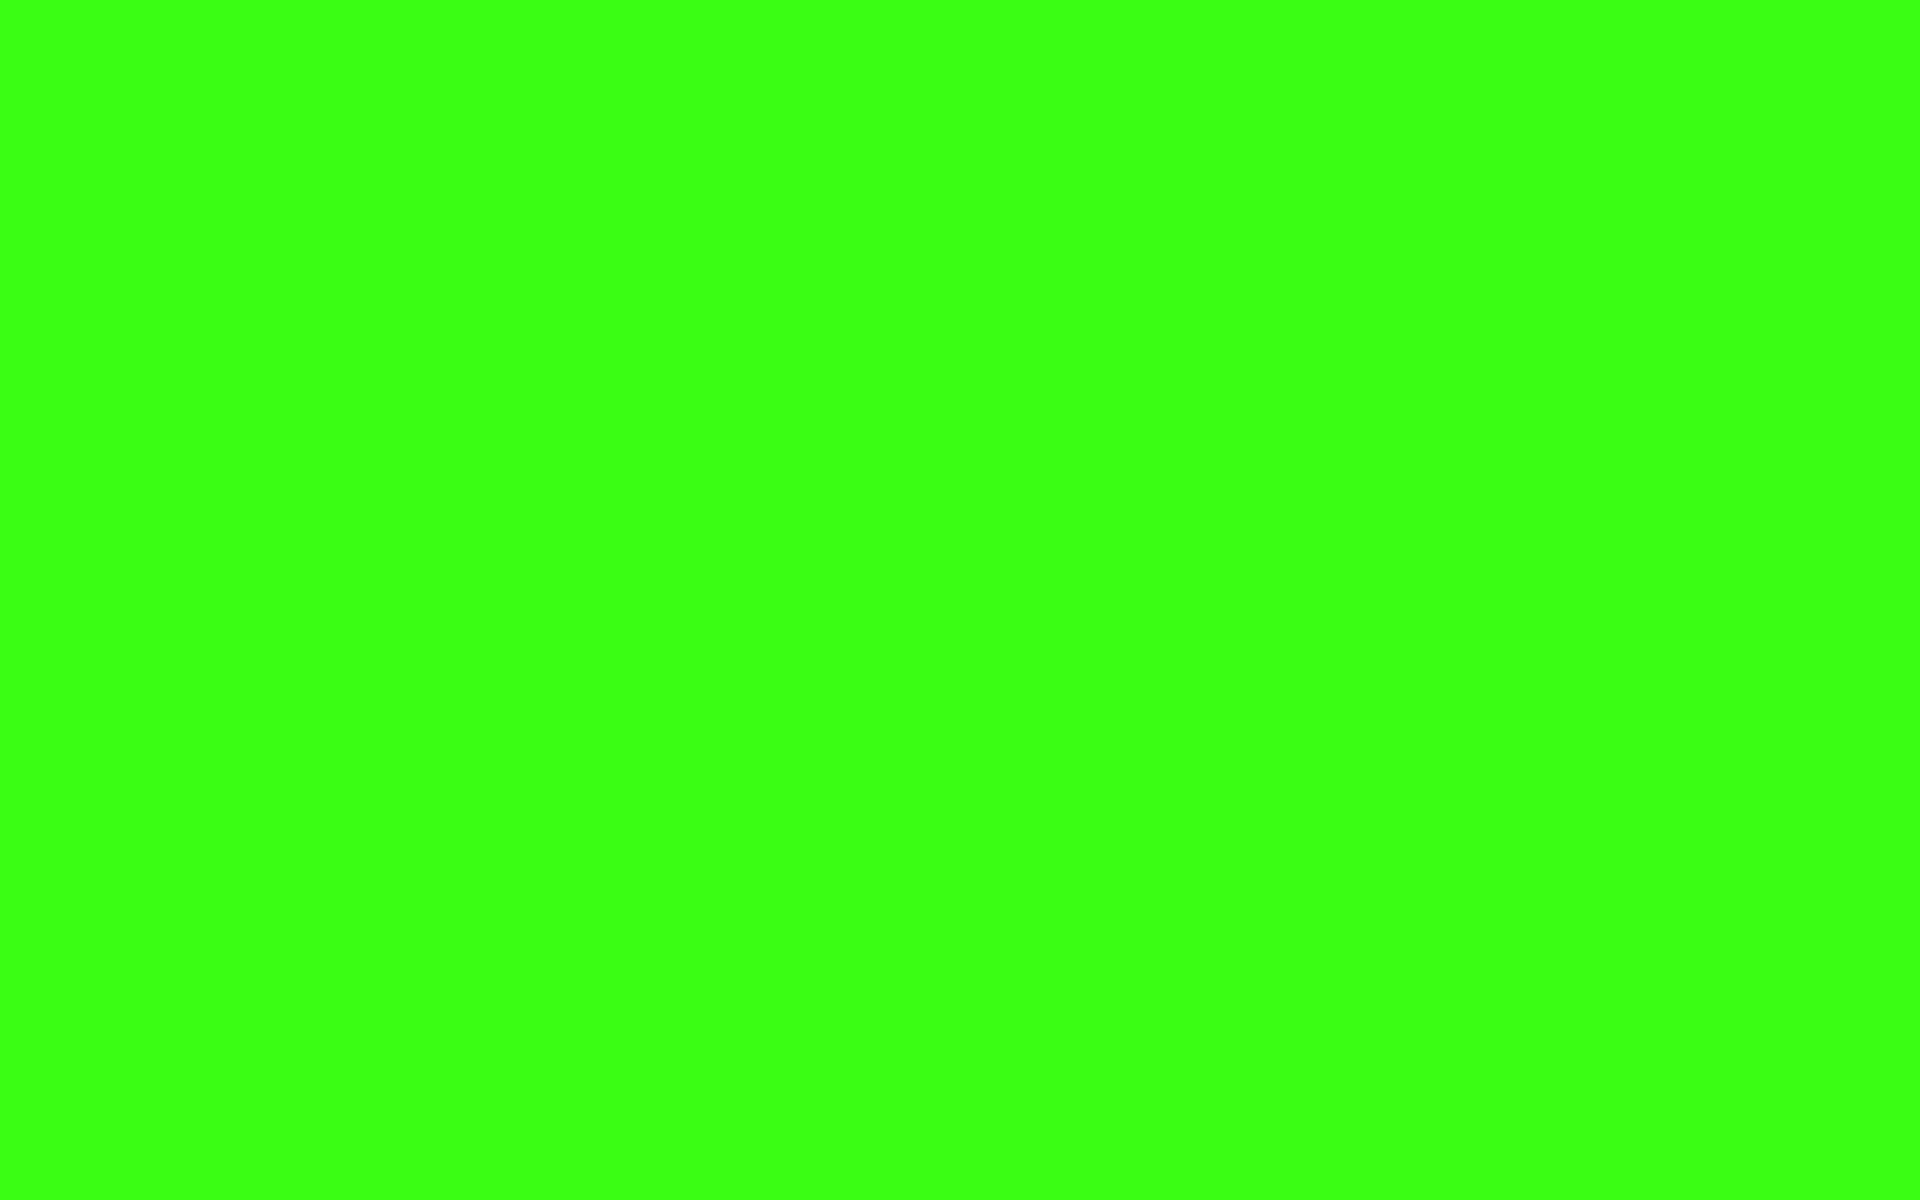 lime color wallpaper - photo #39